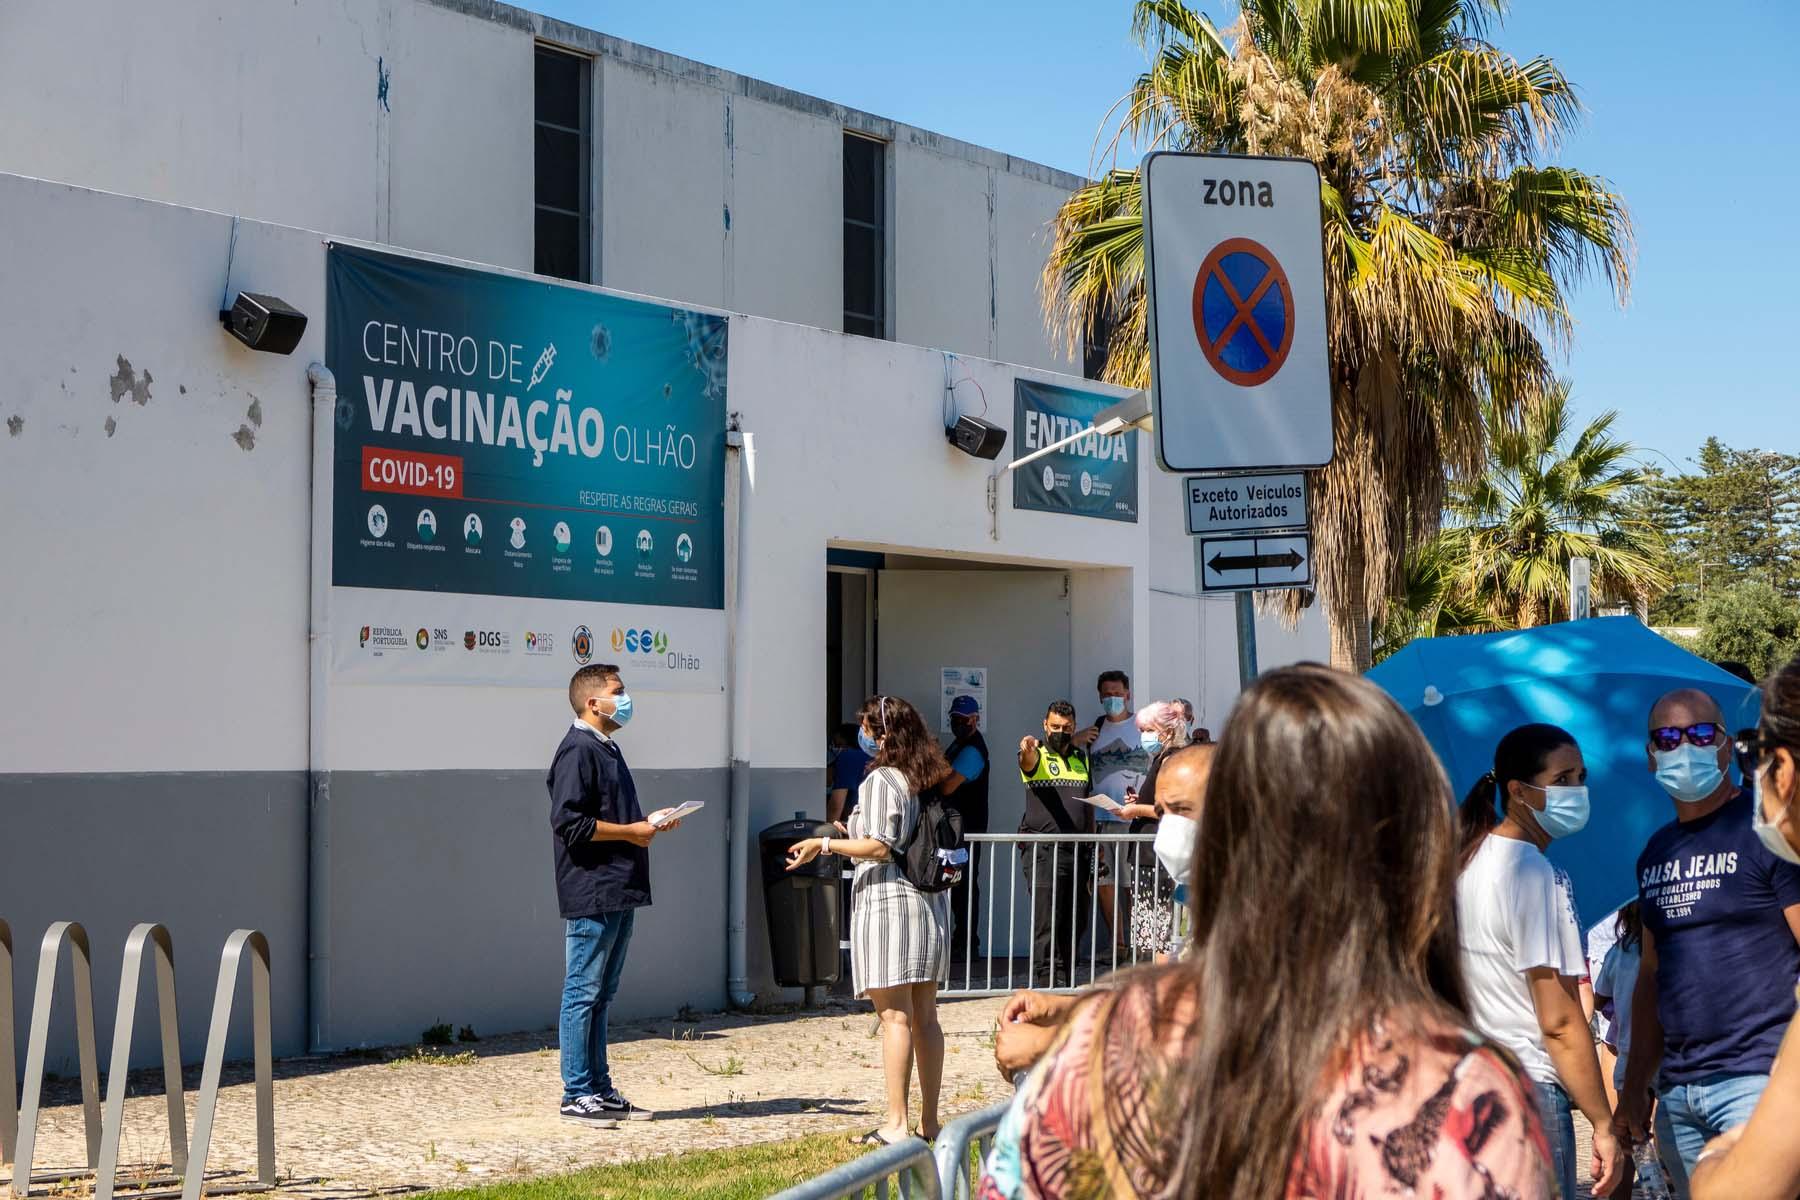 vaccination center Portugal